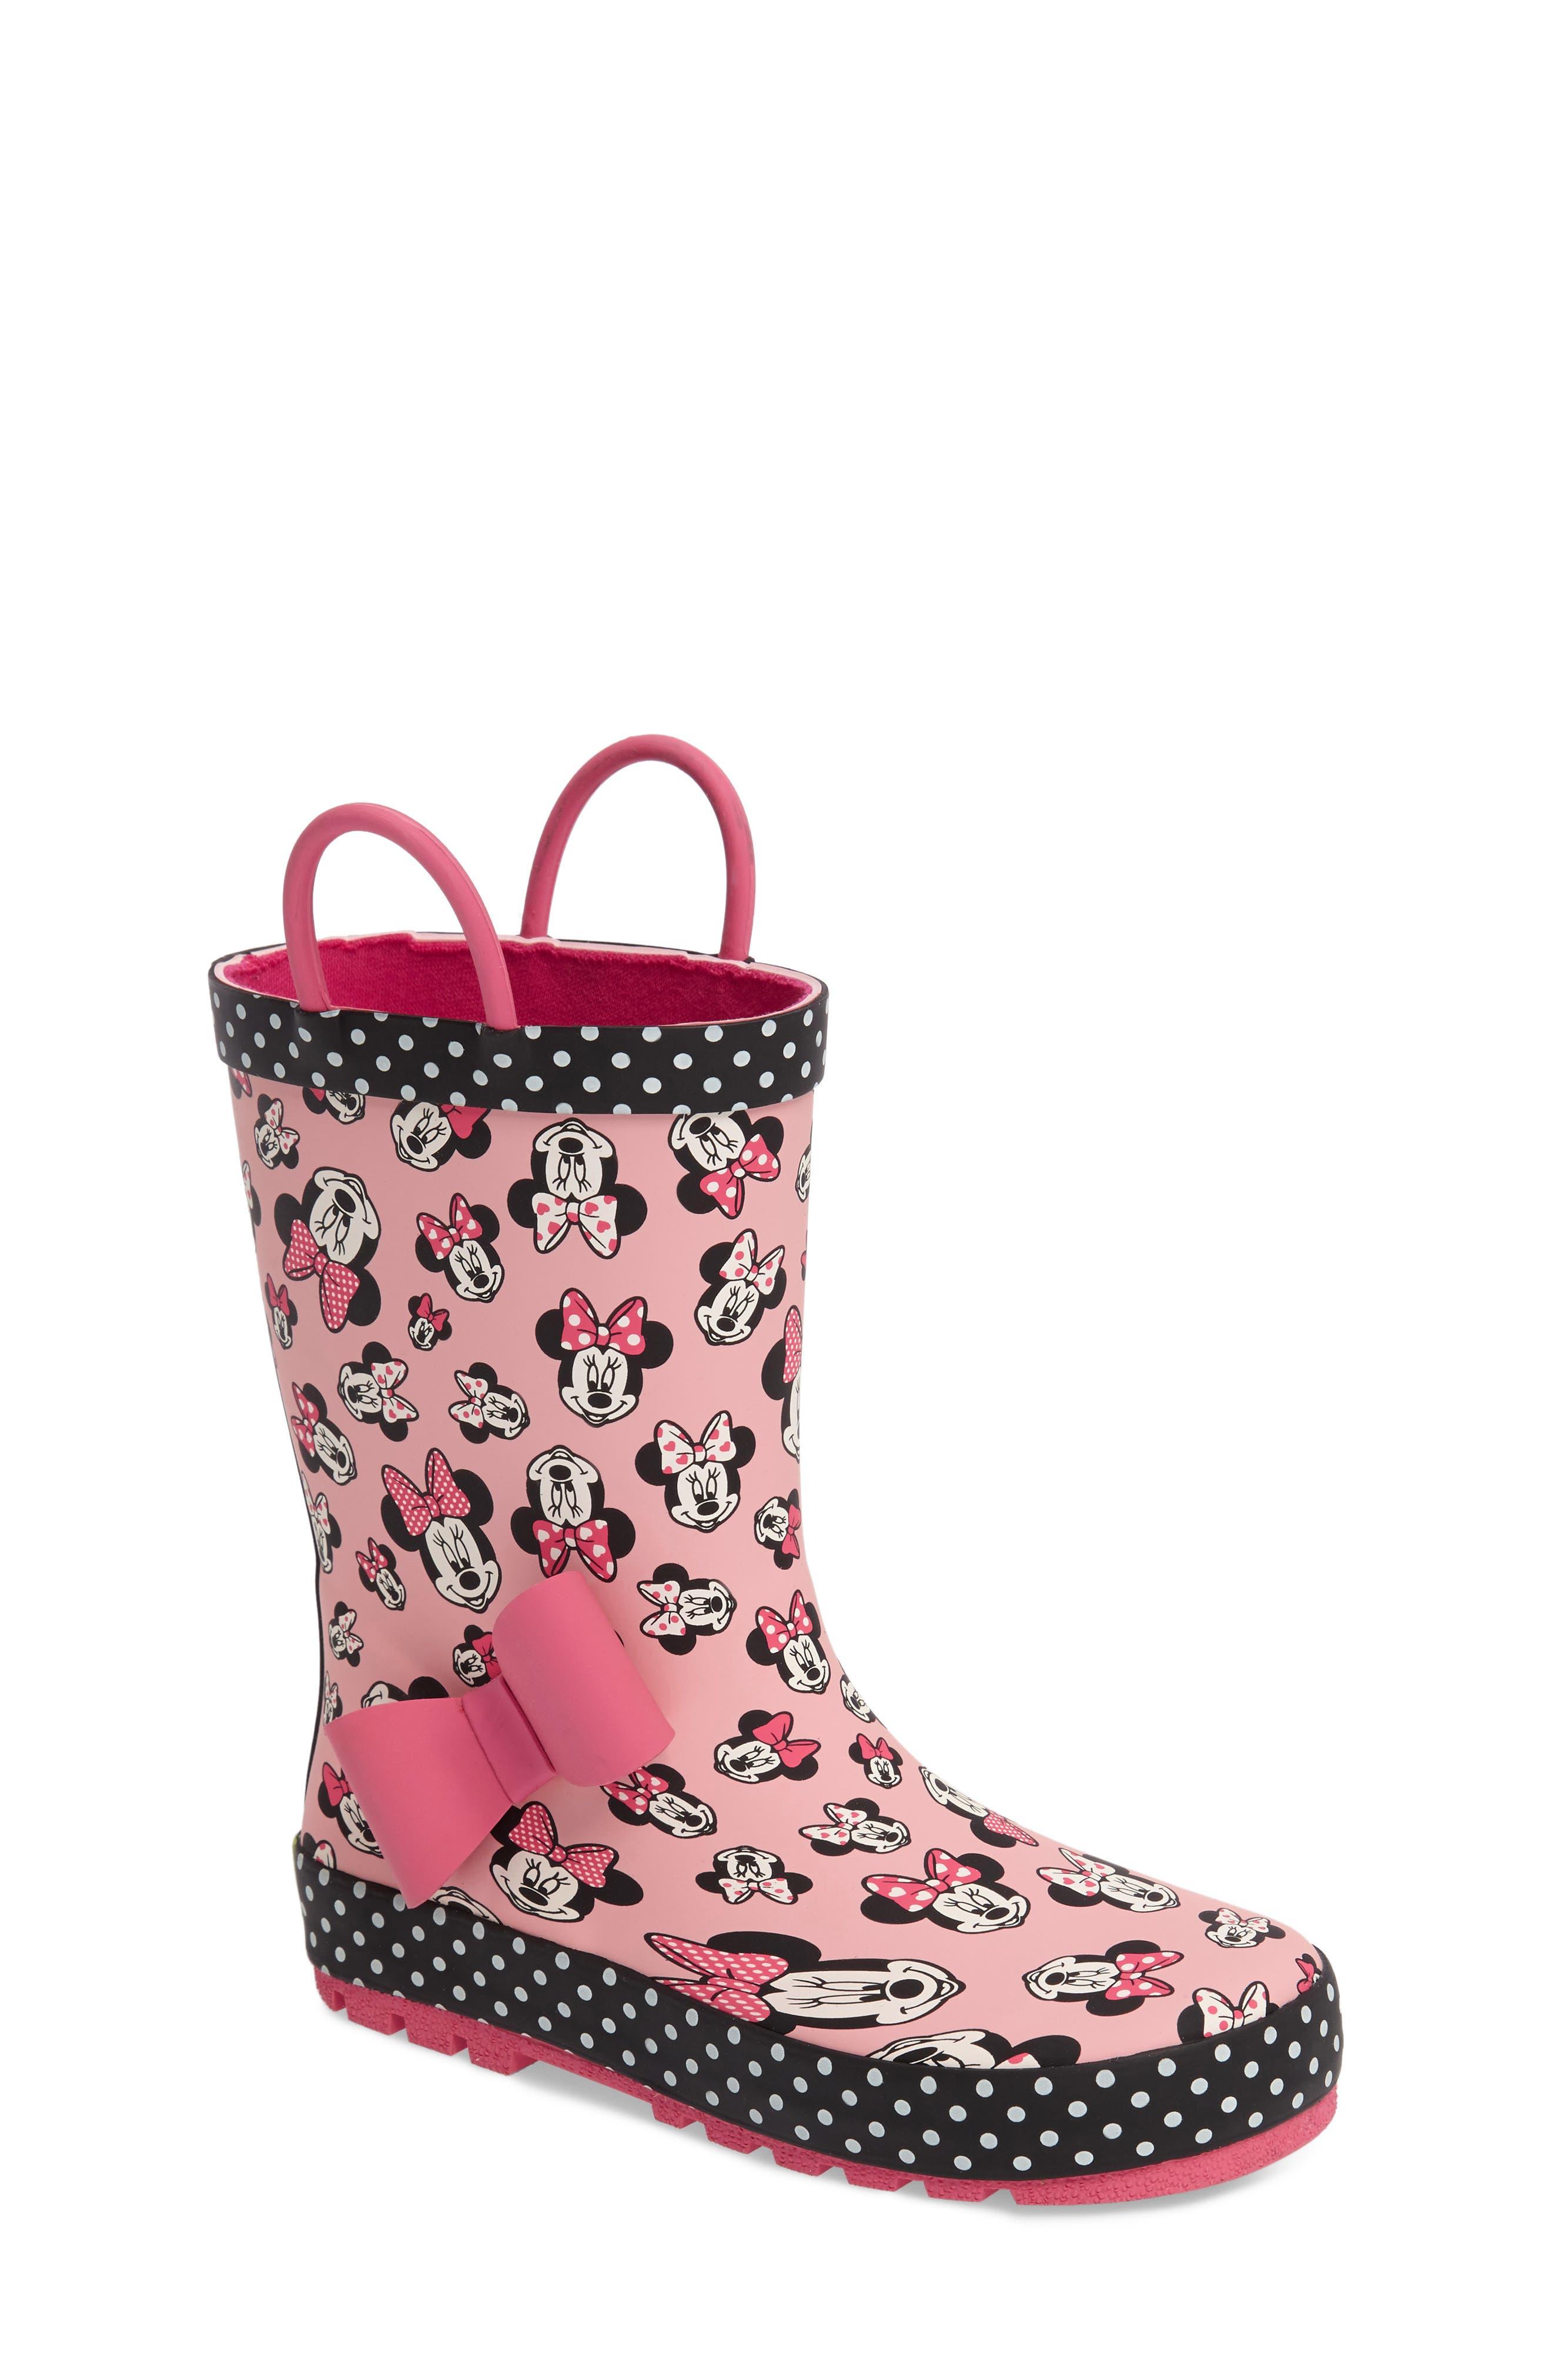 Main Image - Western Chief Disney® Minnie Mouse Waterproof Rain Boot (Walker, Toddler, Little Kid & Big Kid)